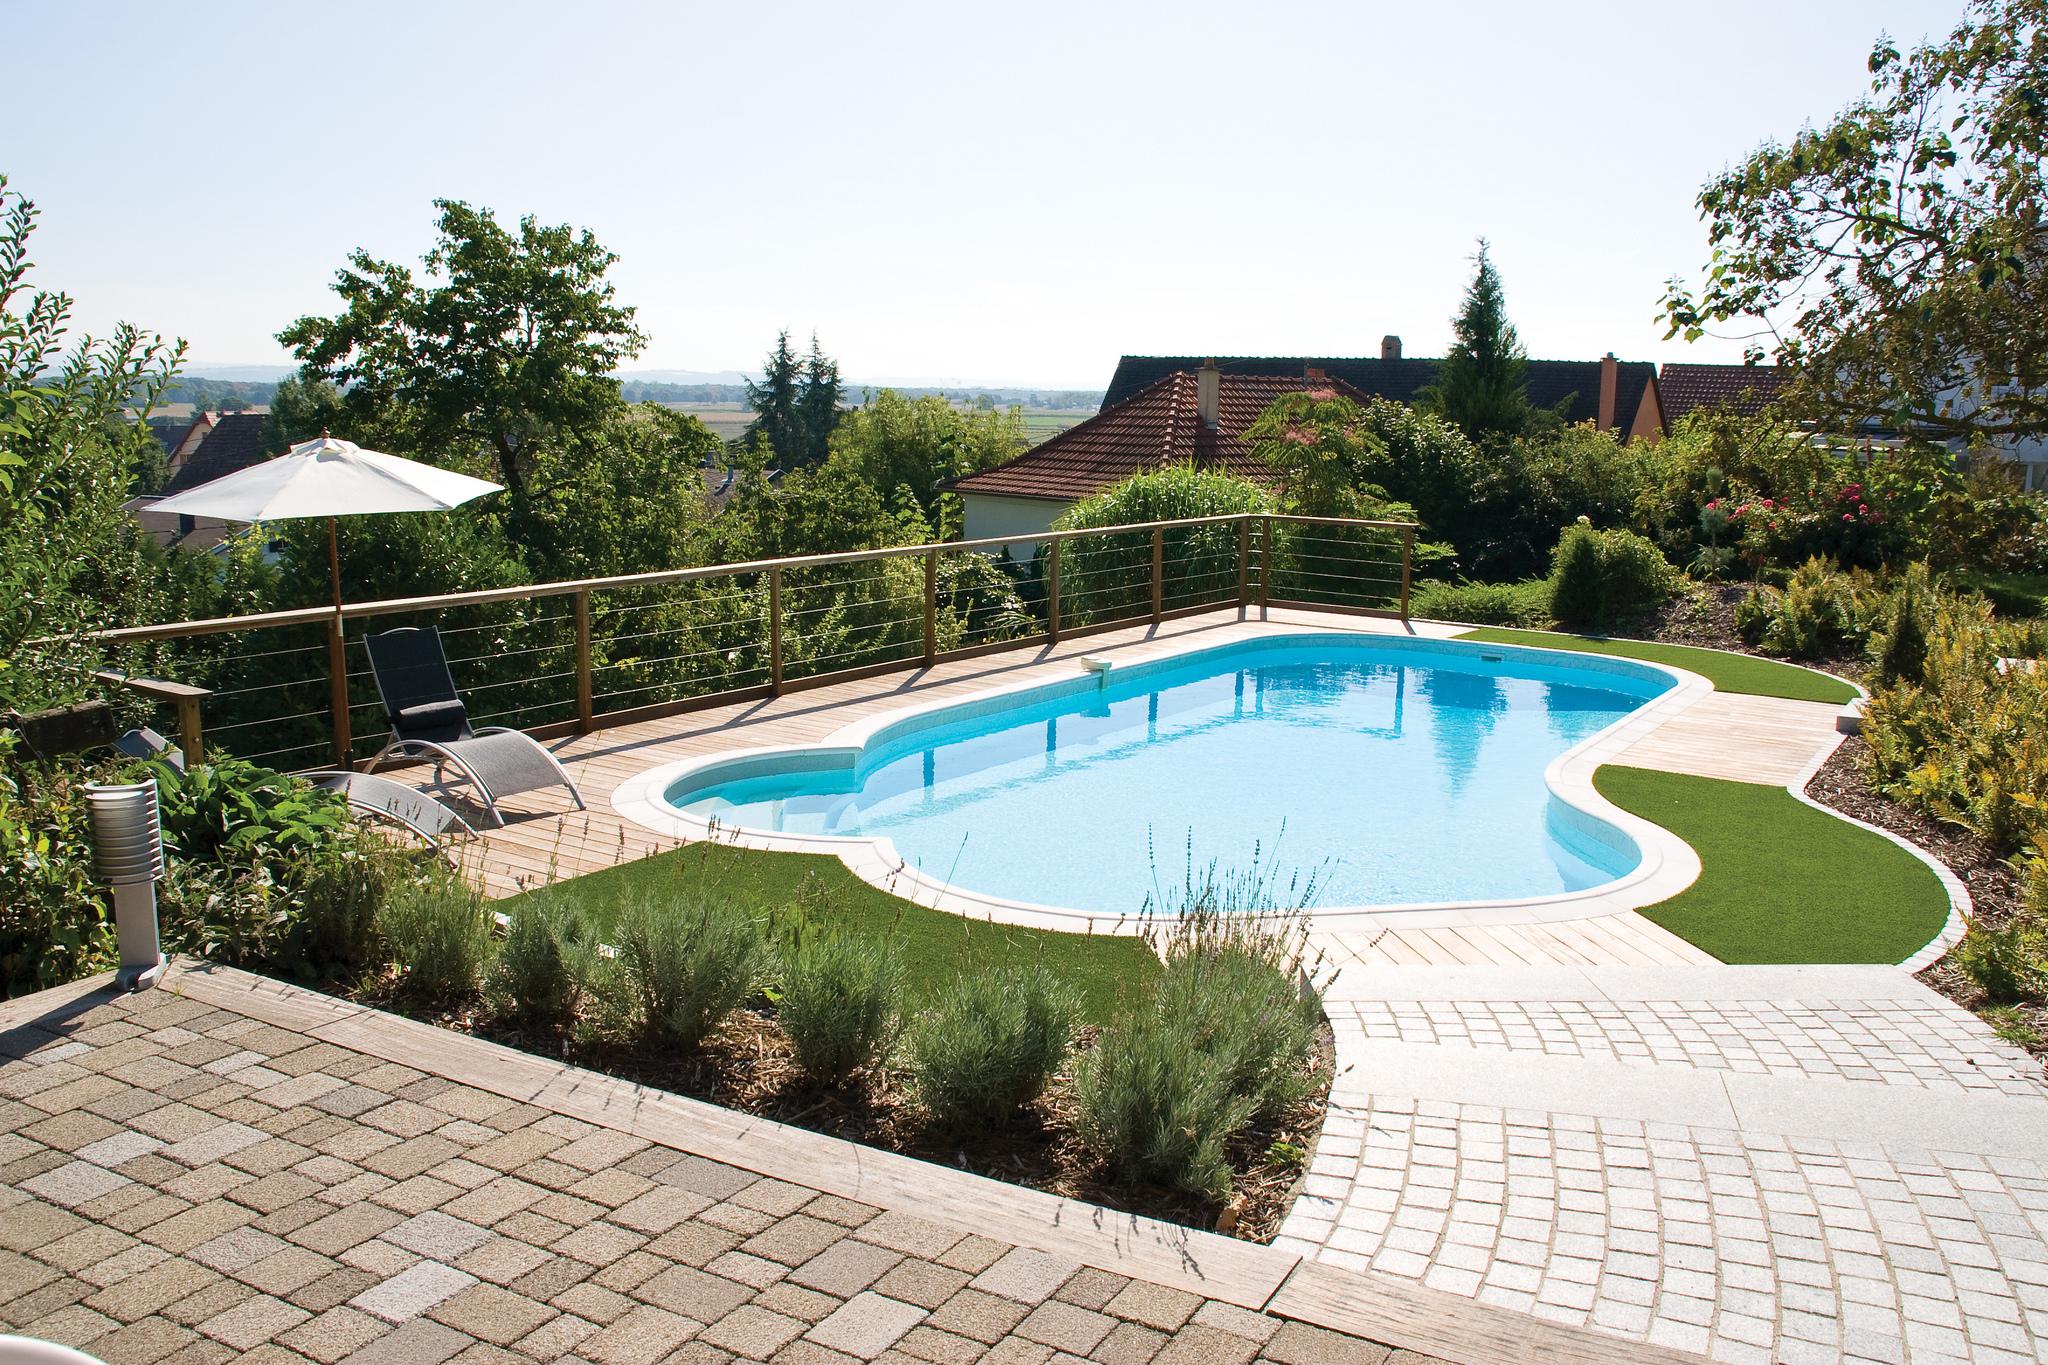 File:piscine-Valérie.jpg - Wikimedia Commons destiné Piscine Originale